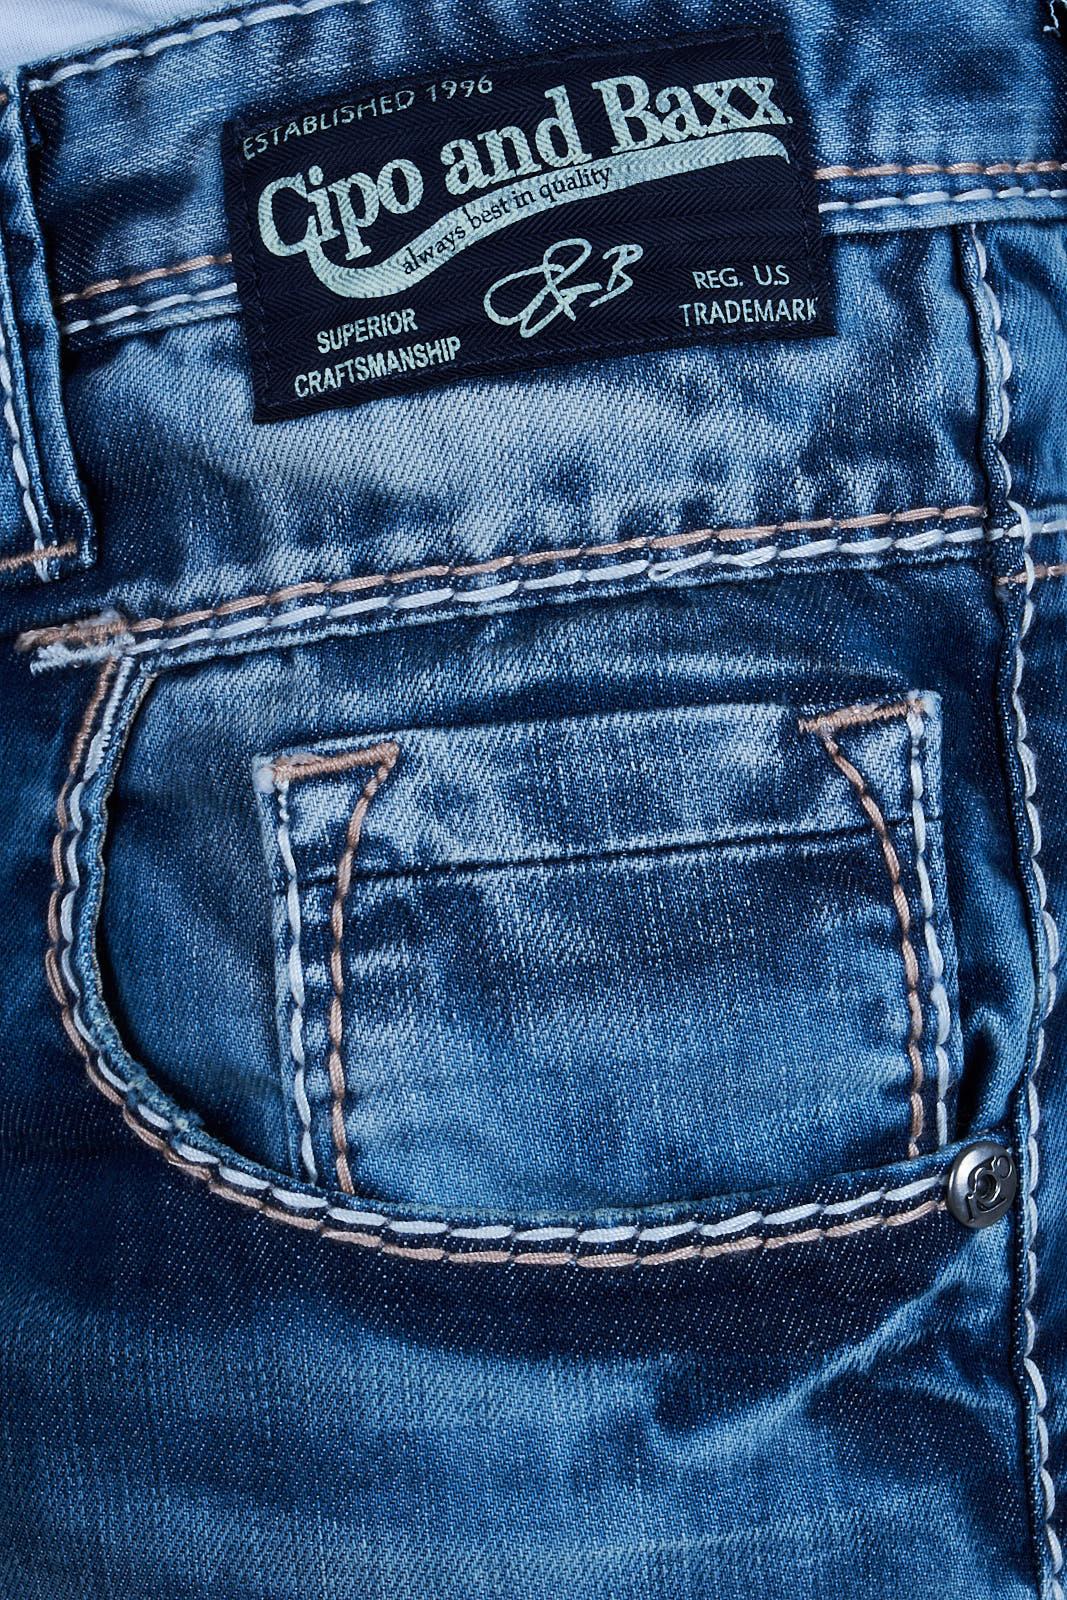 Cipo-amp-Baxx-Mens-Jeans-Clubwear-Denim-Trousers-c-1149-Straight-Thick-Seam-New-C-11 thumbnail 5